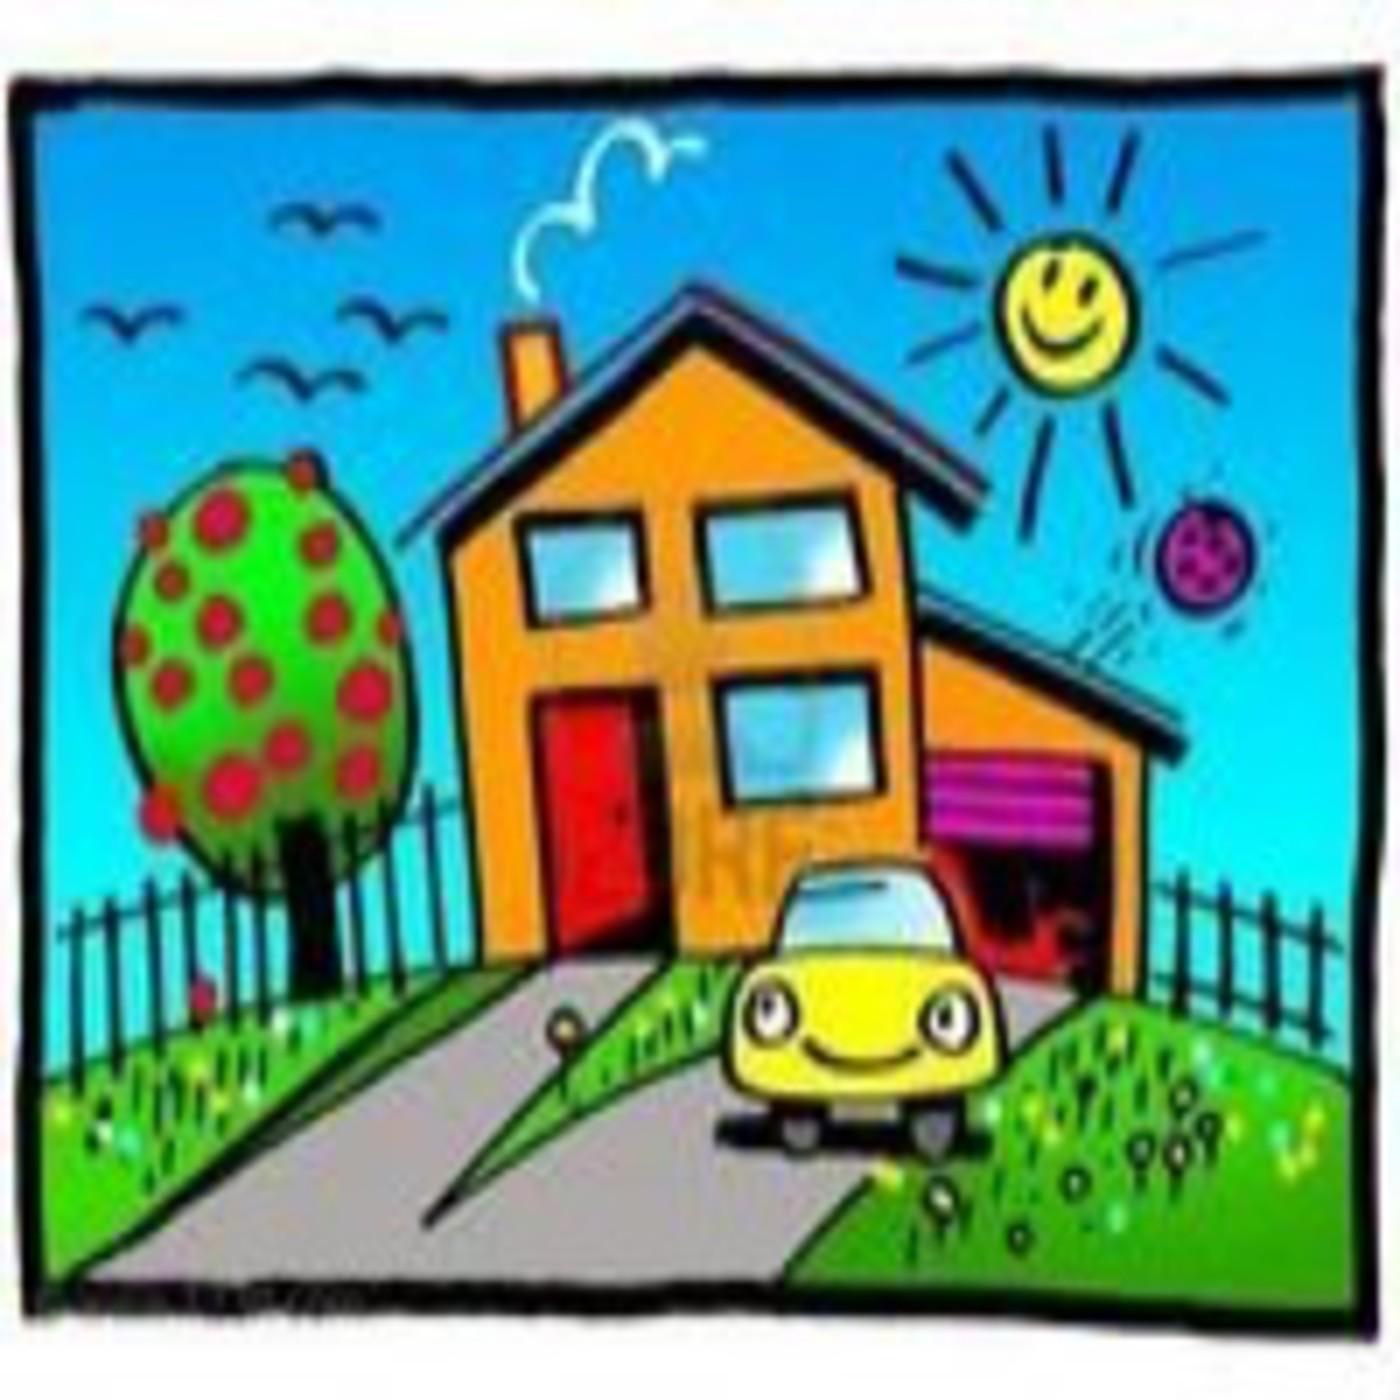 Le parti della casa en podcast le parti della casa en mp3 for Campionare le planimetrie della casa